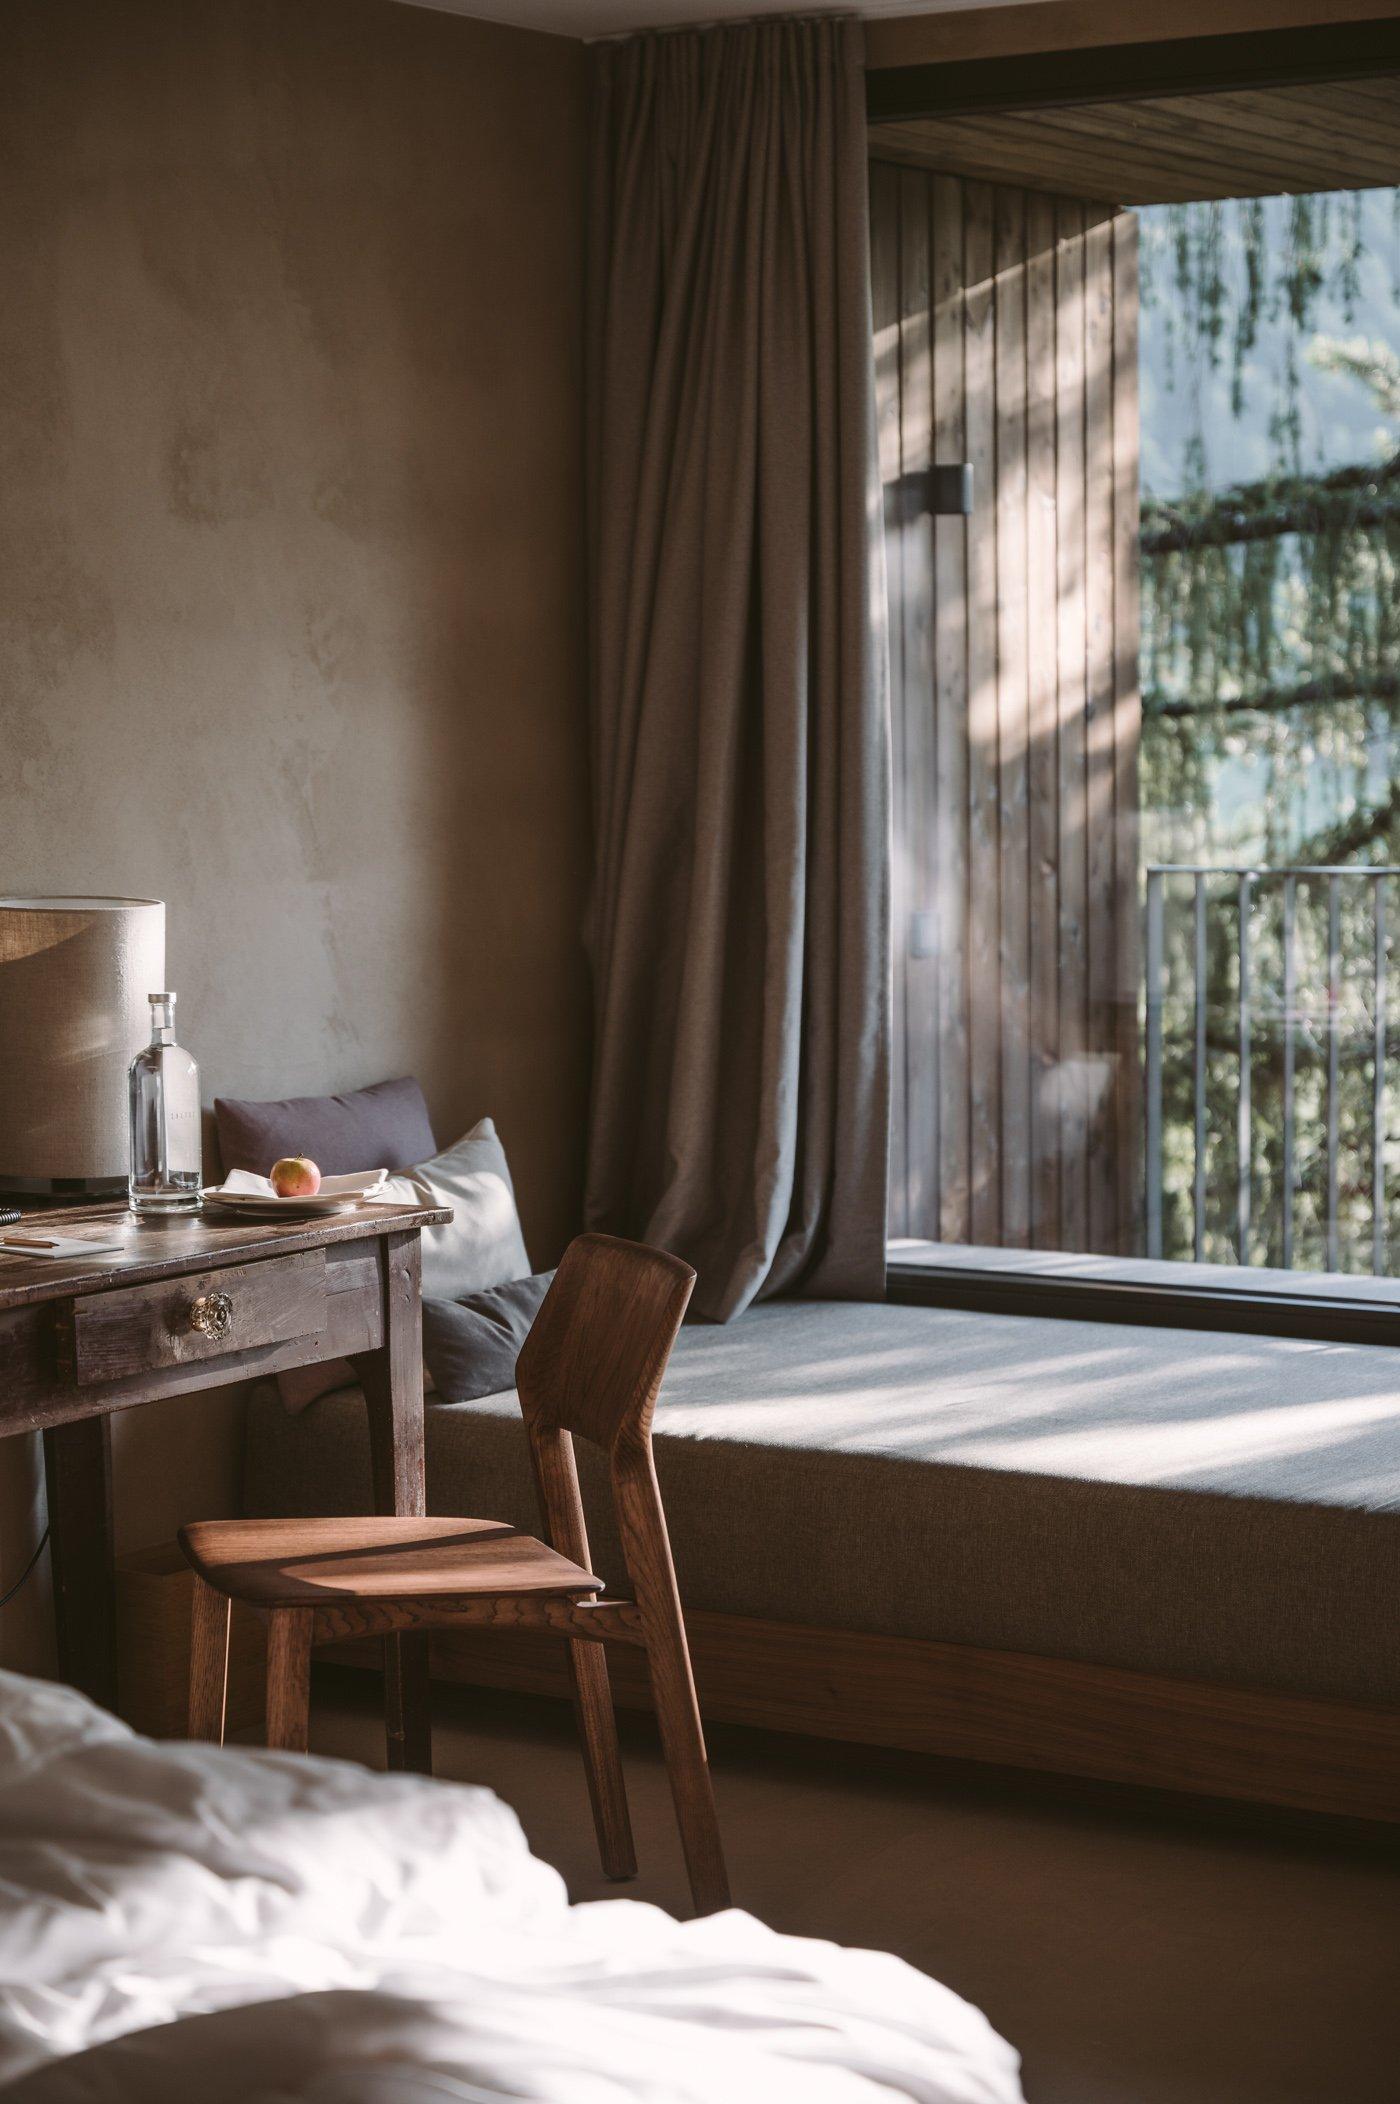 Hotel Saltus South Tyrol